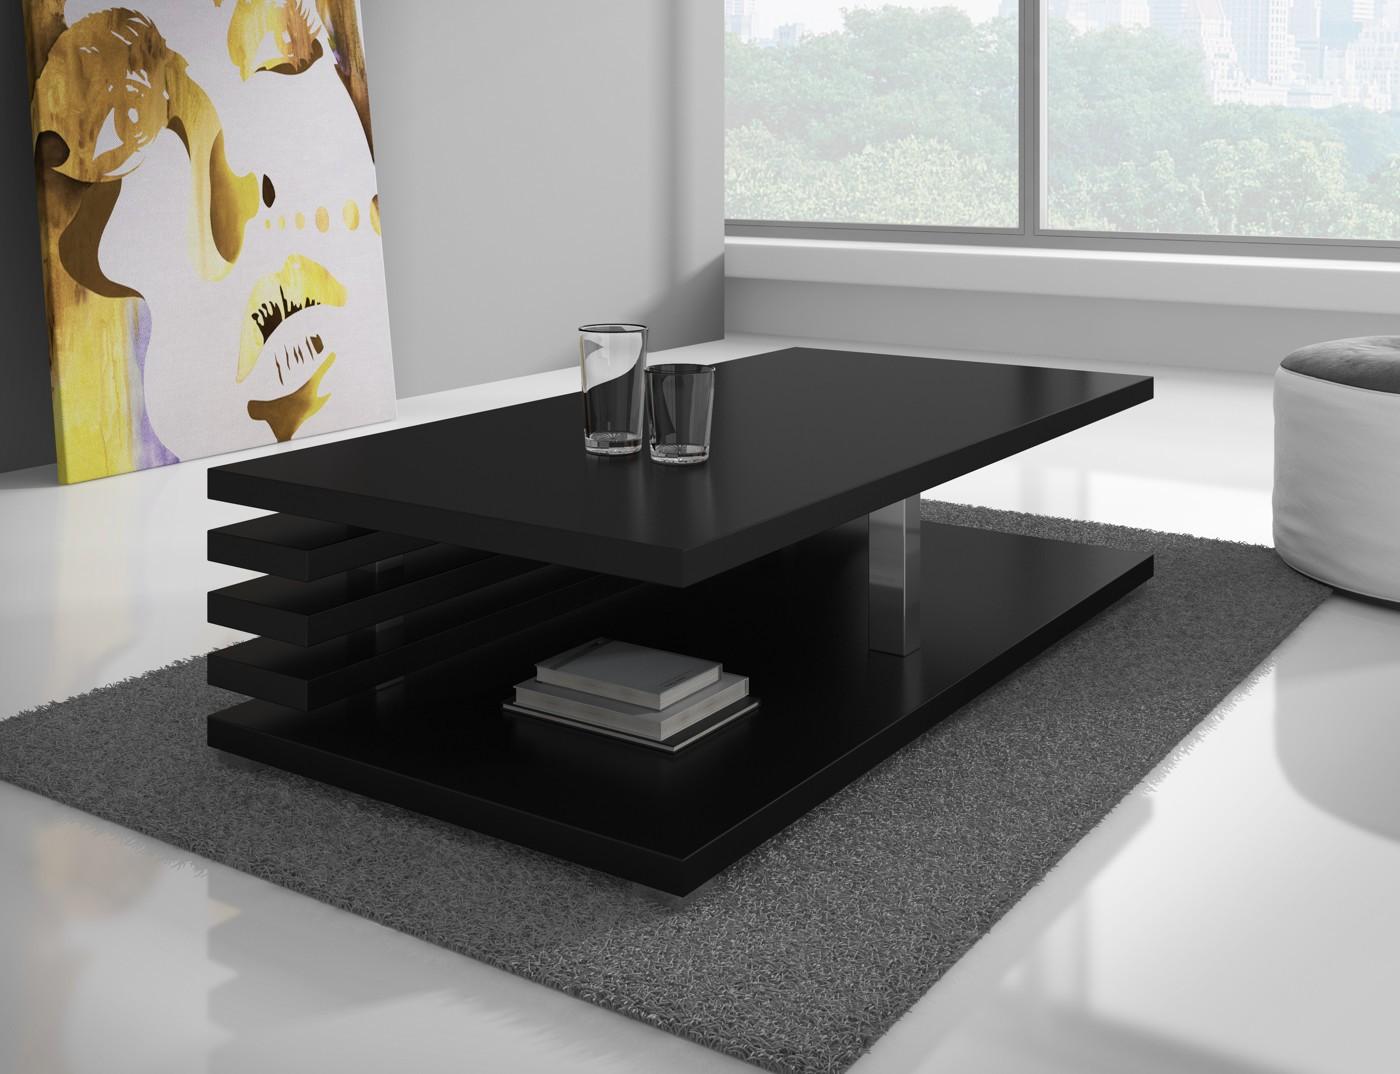 Salontafel altea zwart salontafels overig woonkamer meubella - Woonkamer in zwart ...